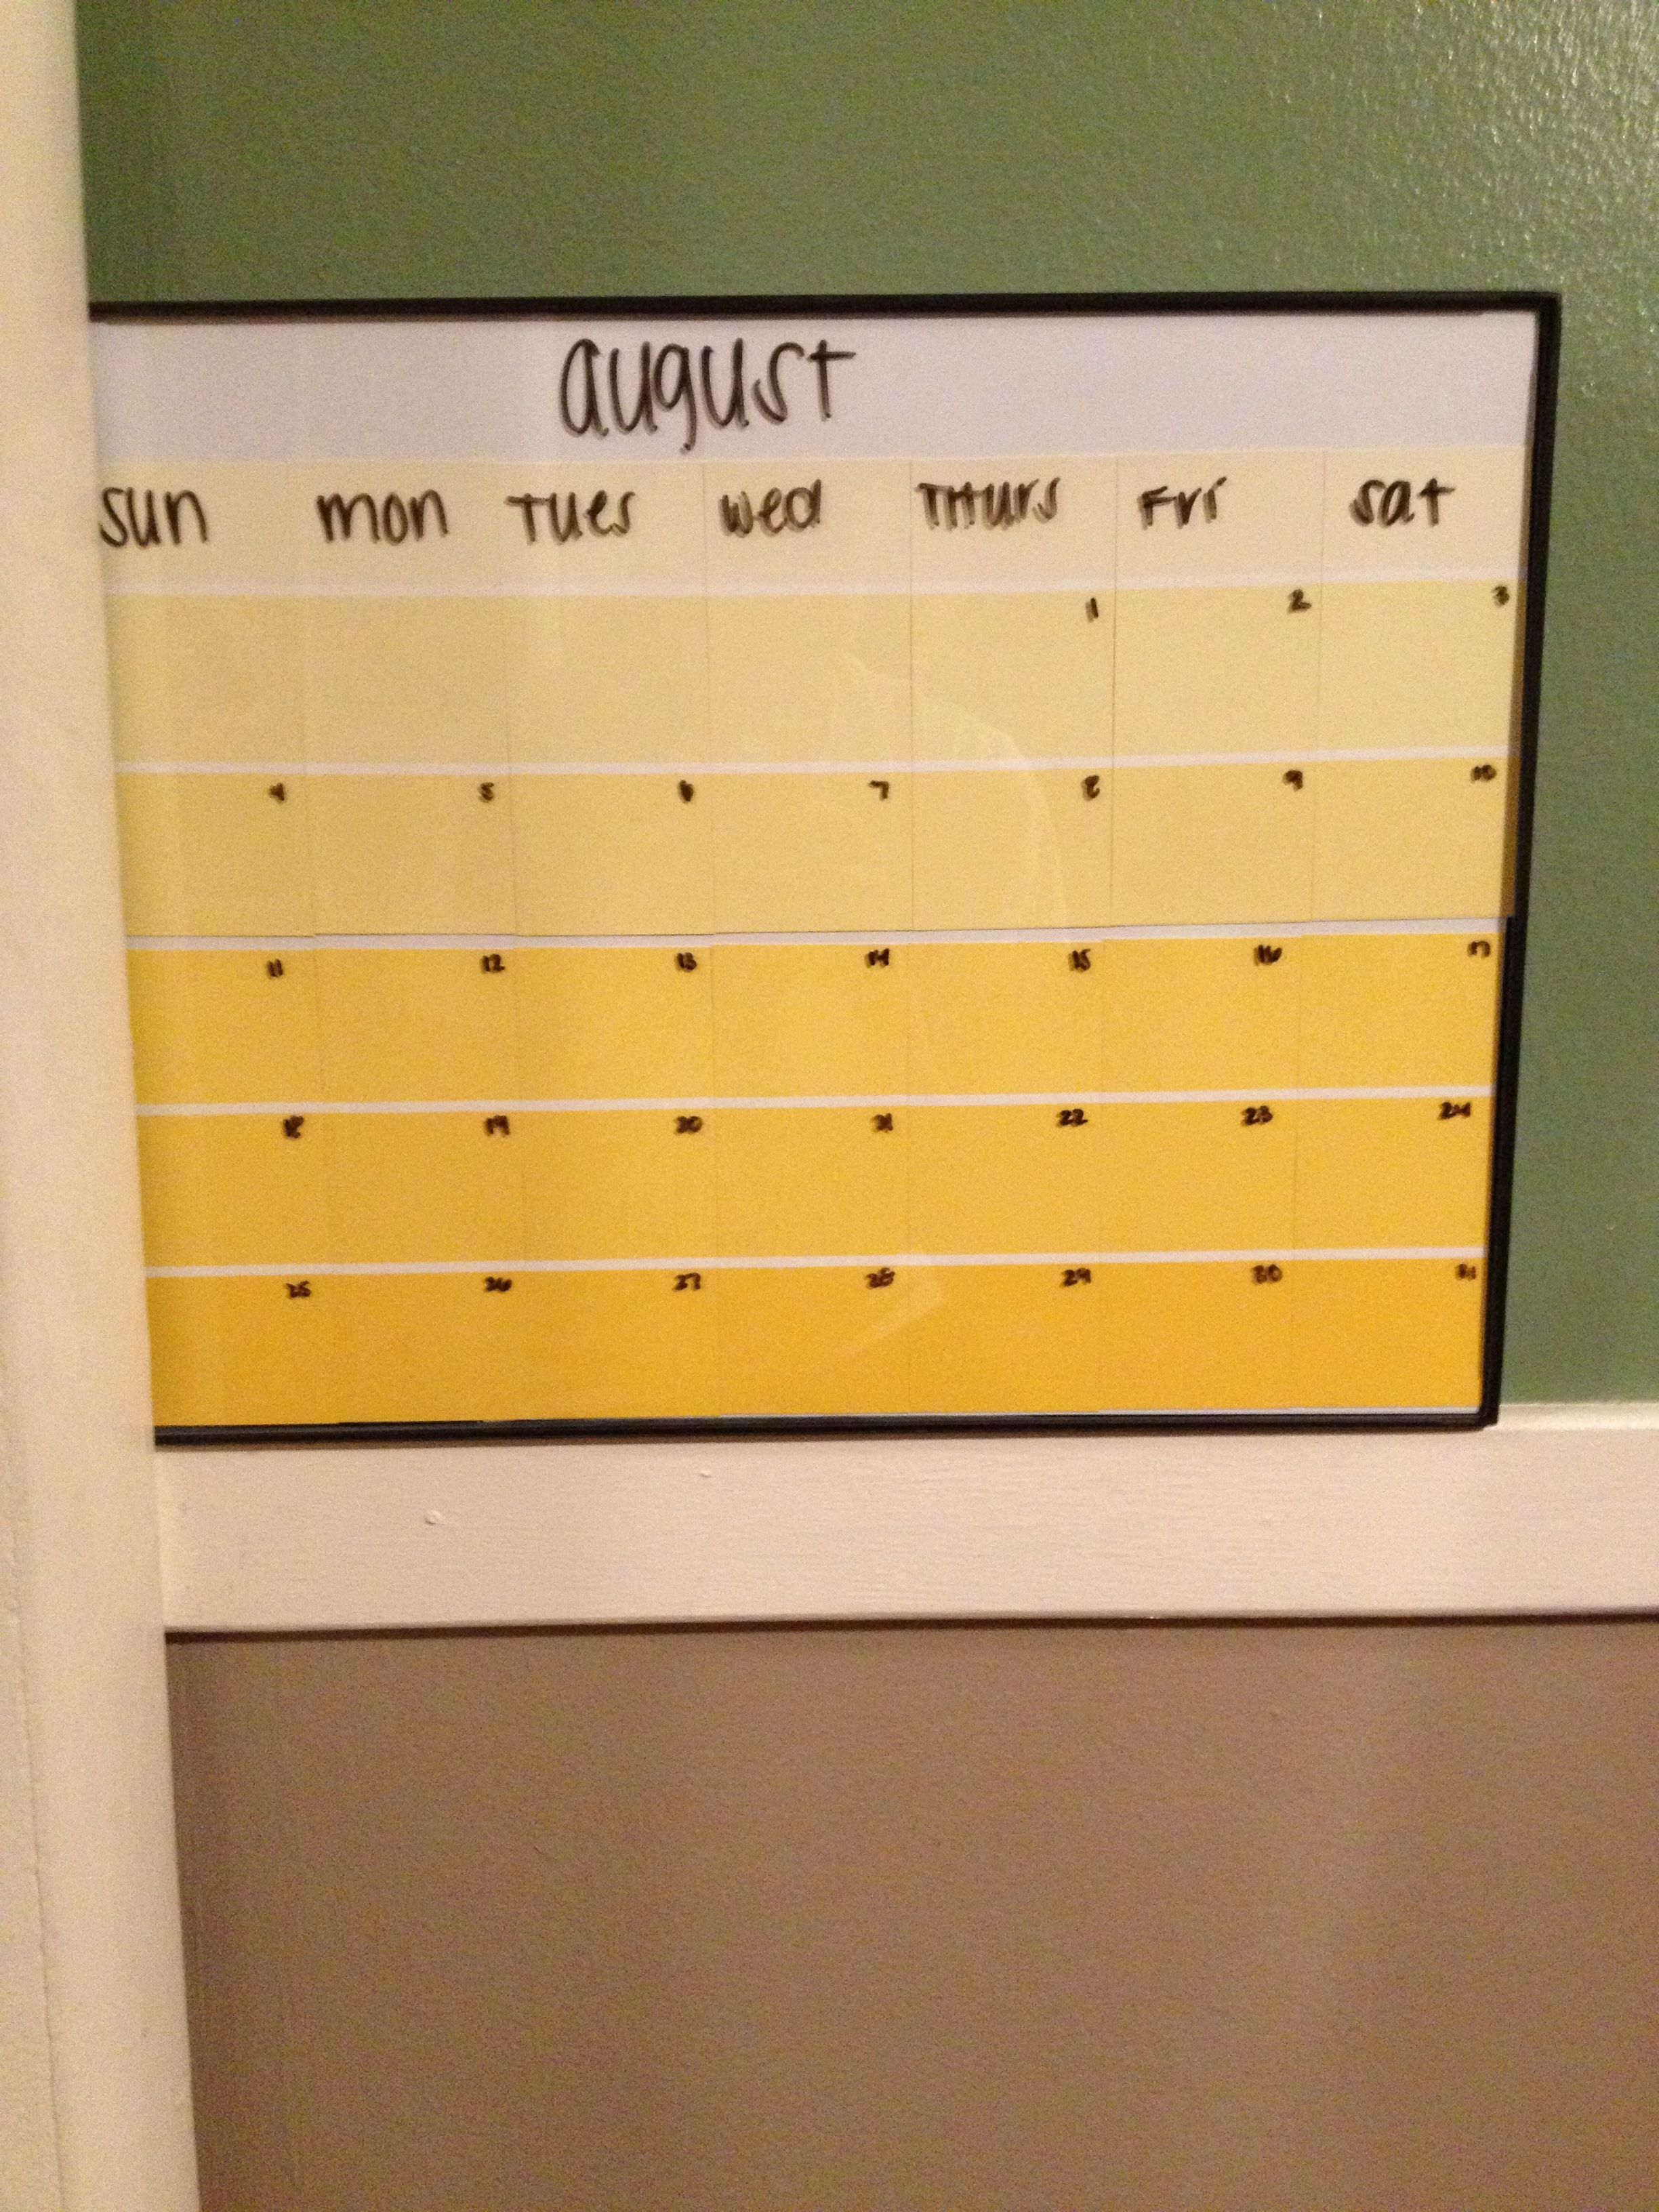 Diy Paint Sample Calendar I Made For My Dorm Room With A X